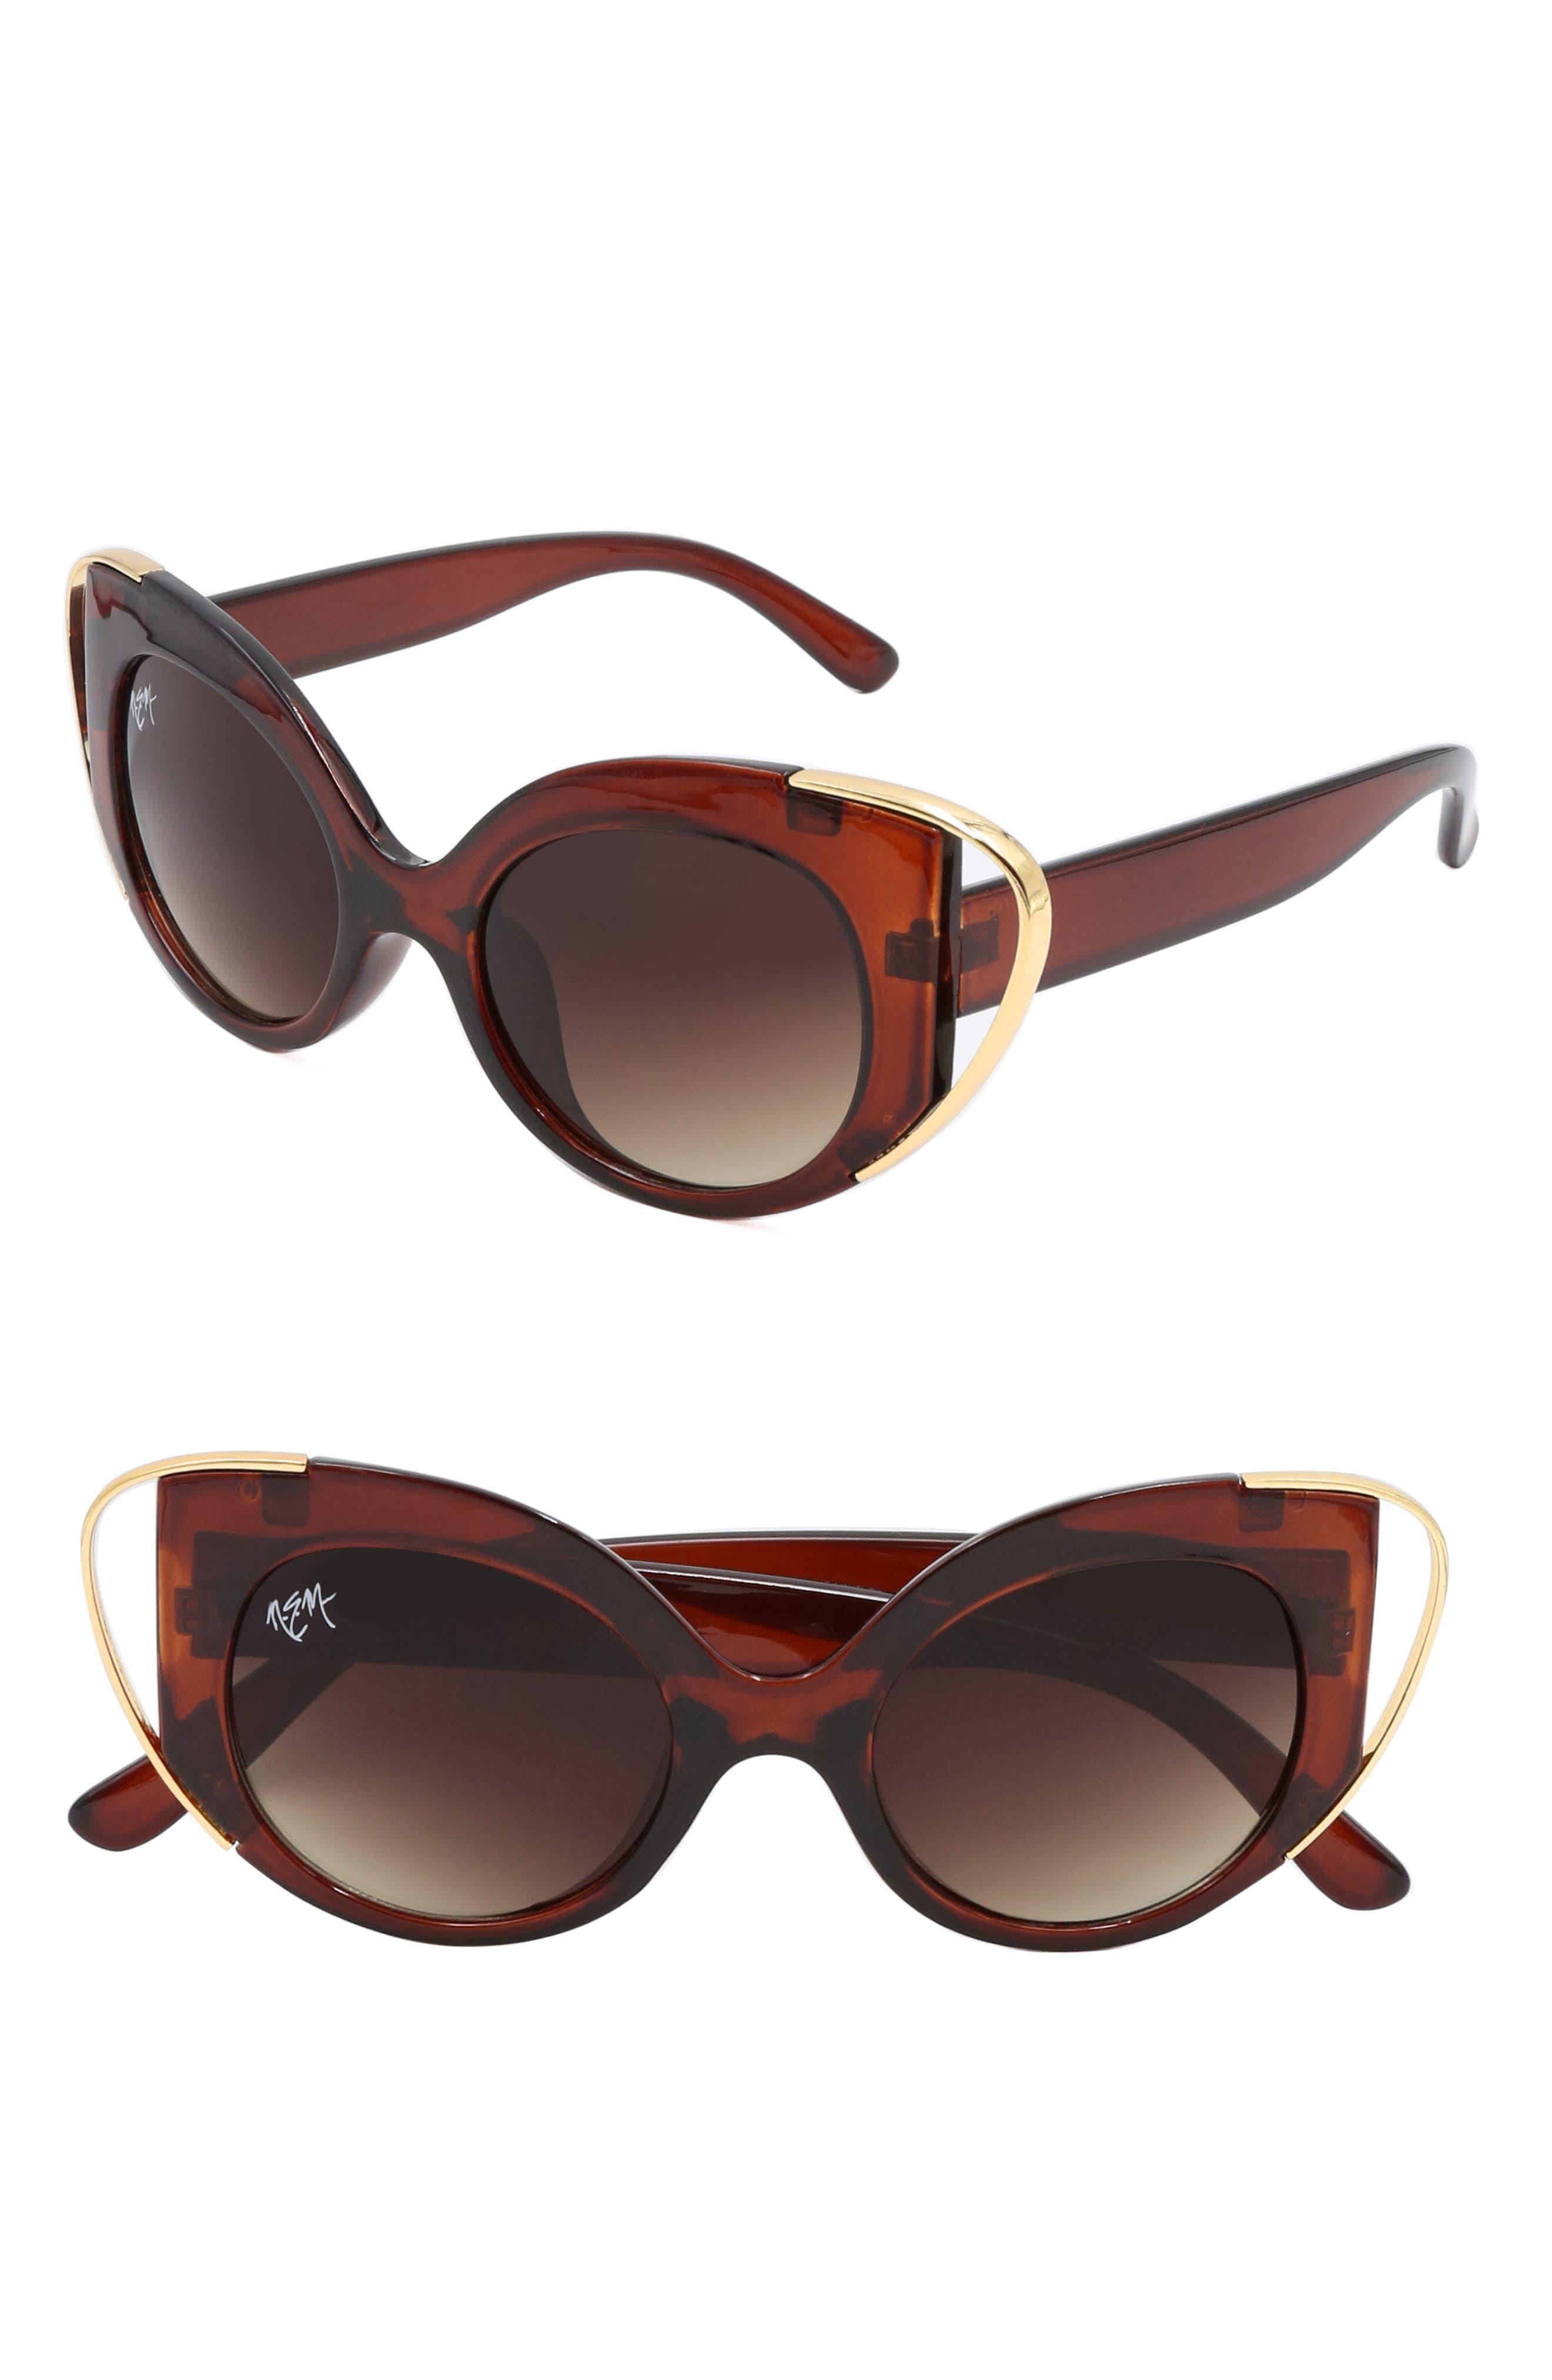 Nem Audrey 50Mm Cutout Cat Eye Sunglasses - Clear Amber W Grey Gradient